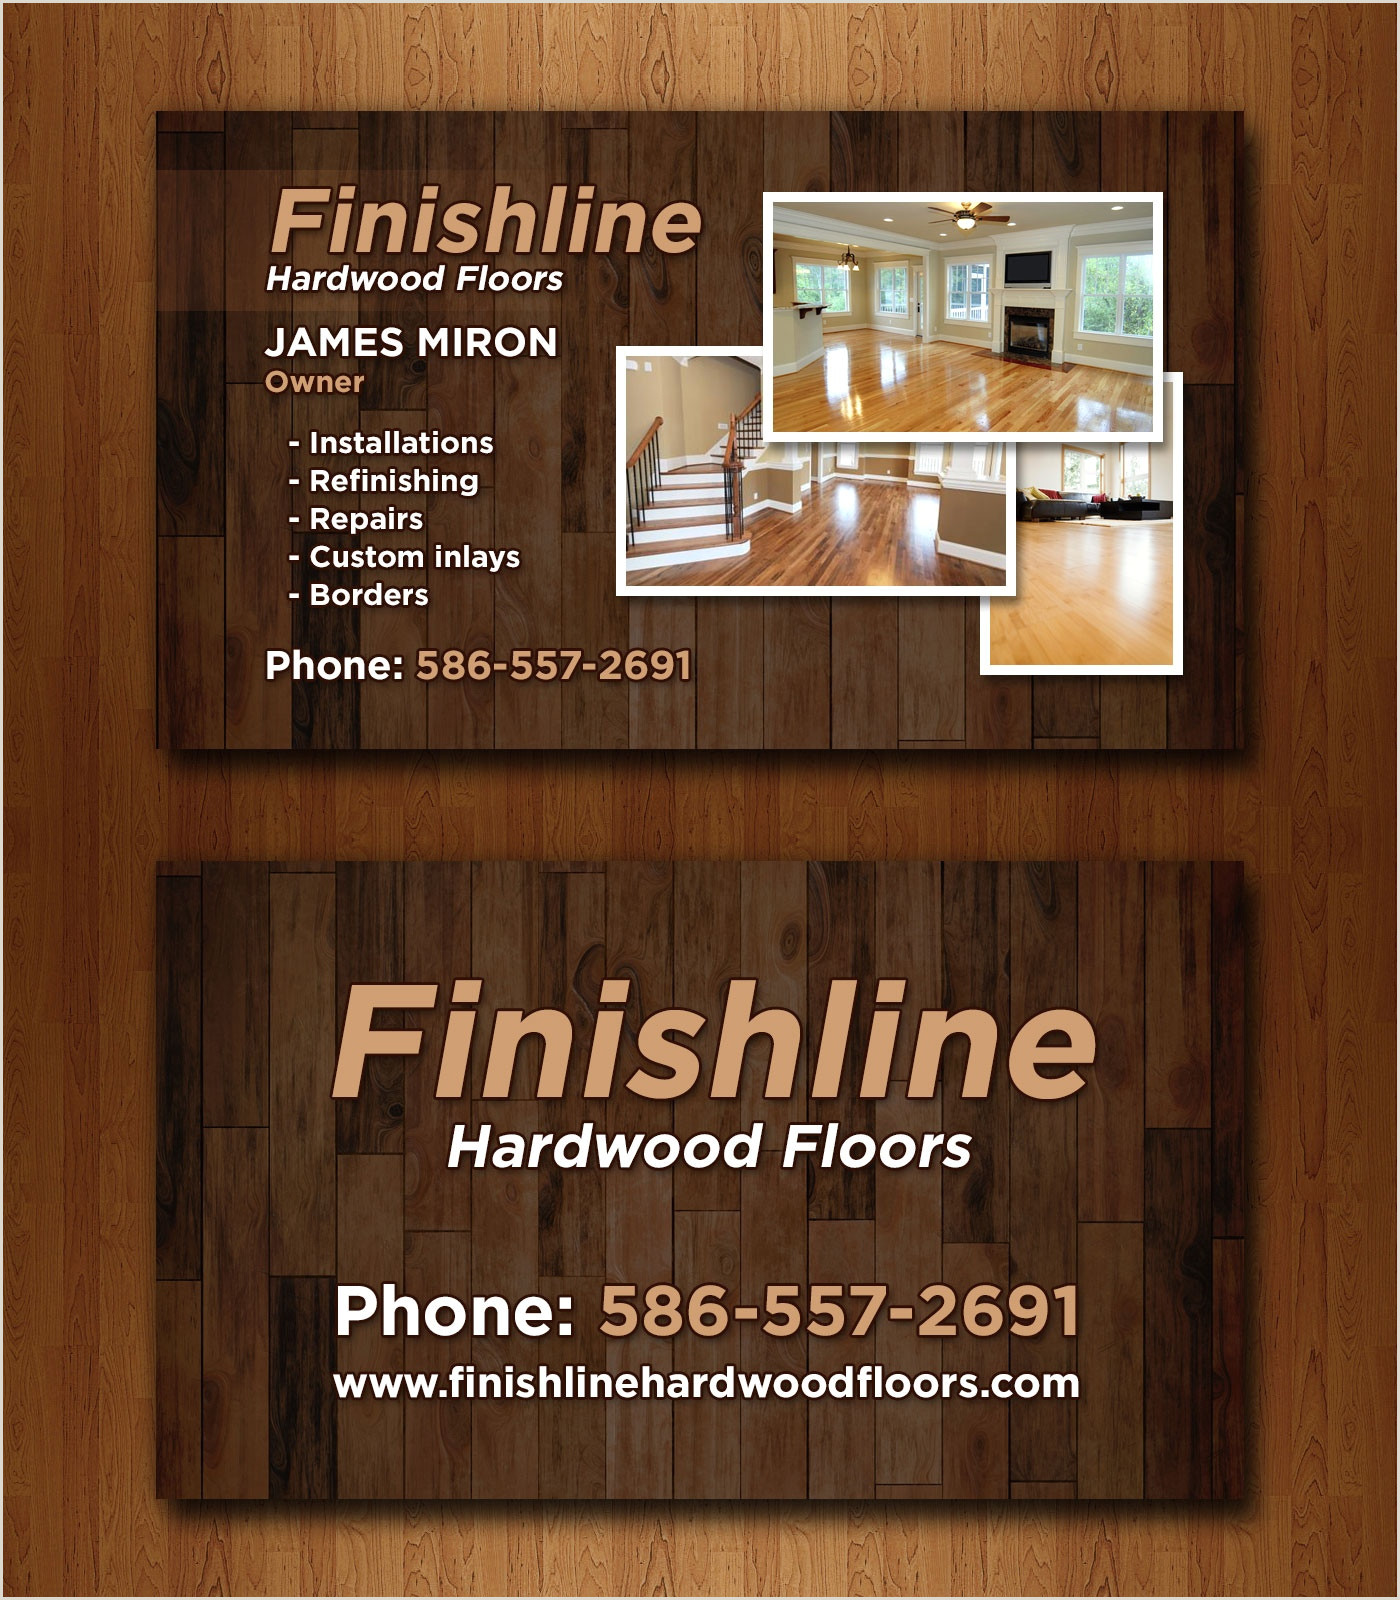 Template Business Cards 14 Popular Hardwood Flooring Business Card Template